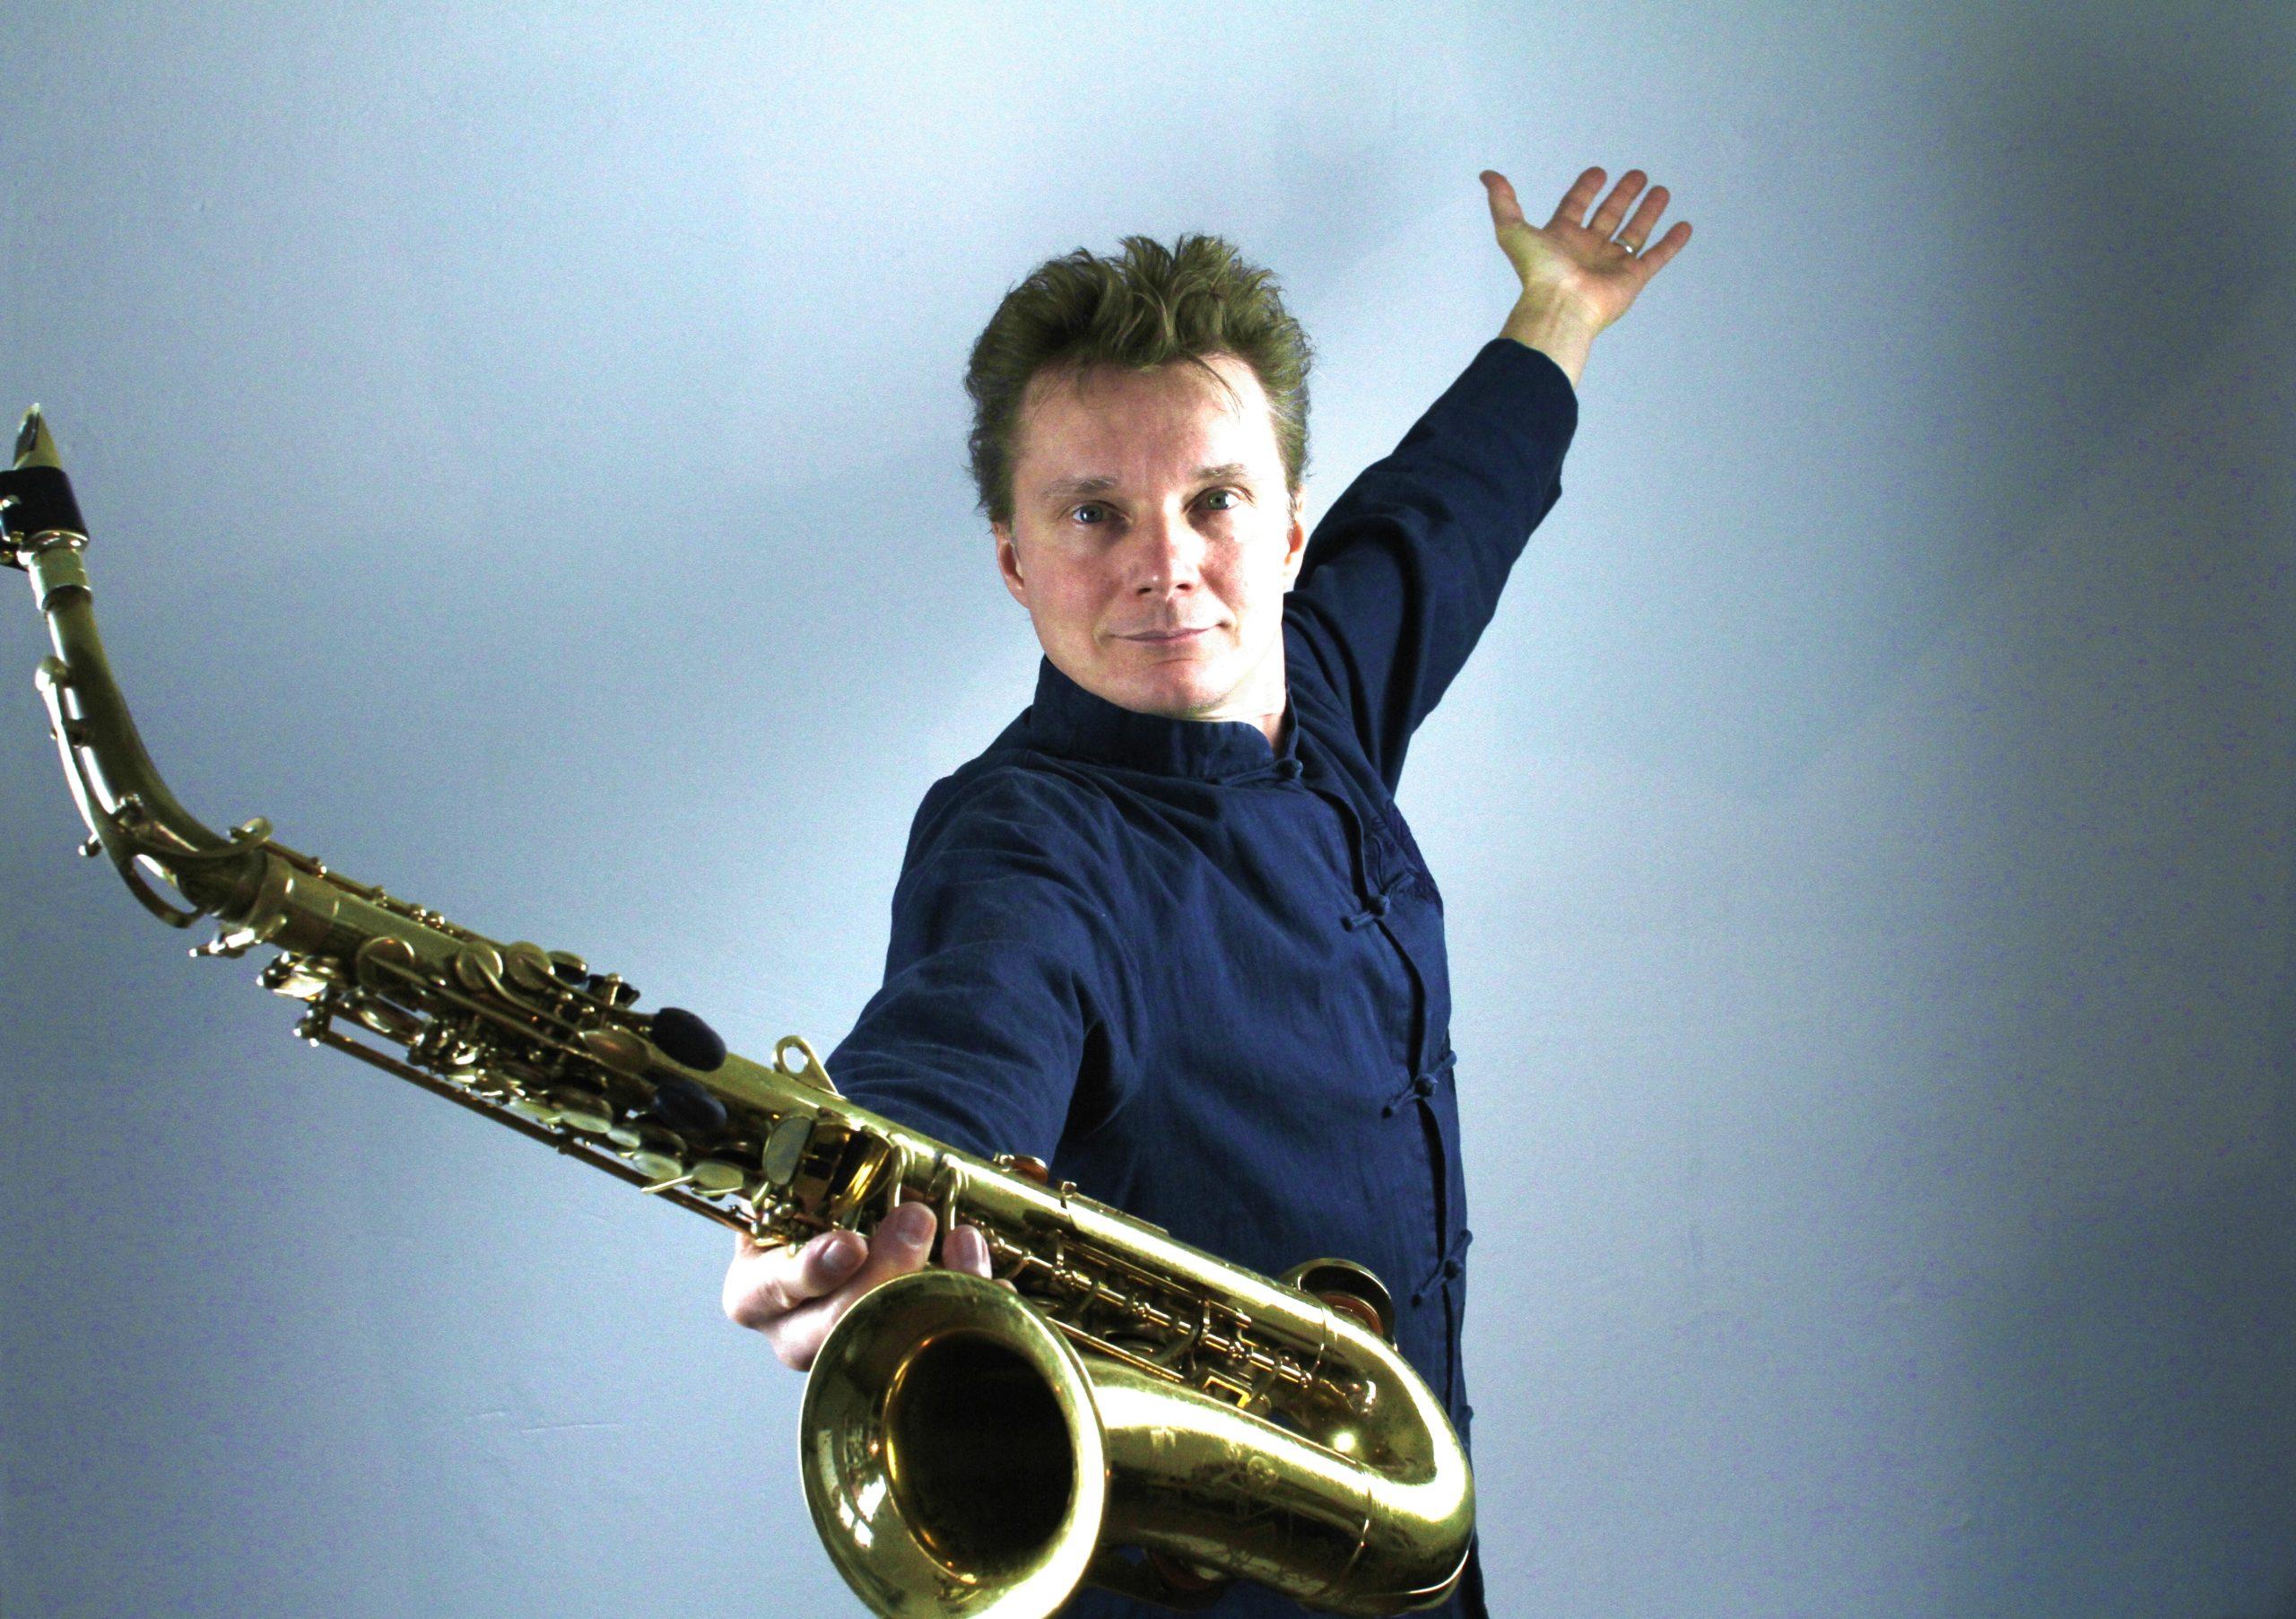 Pressefoto Mat Clasen Saxophon Solo Show